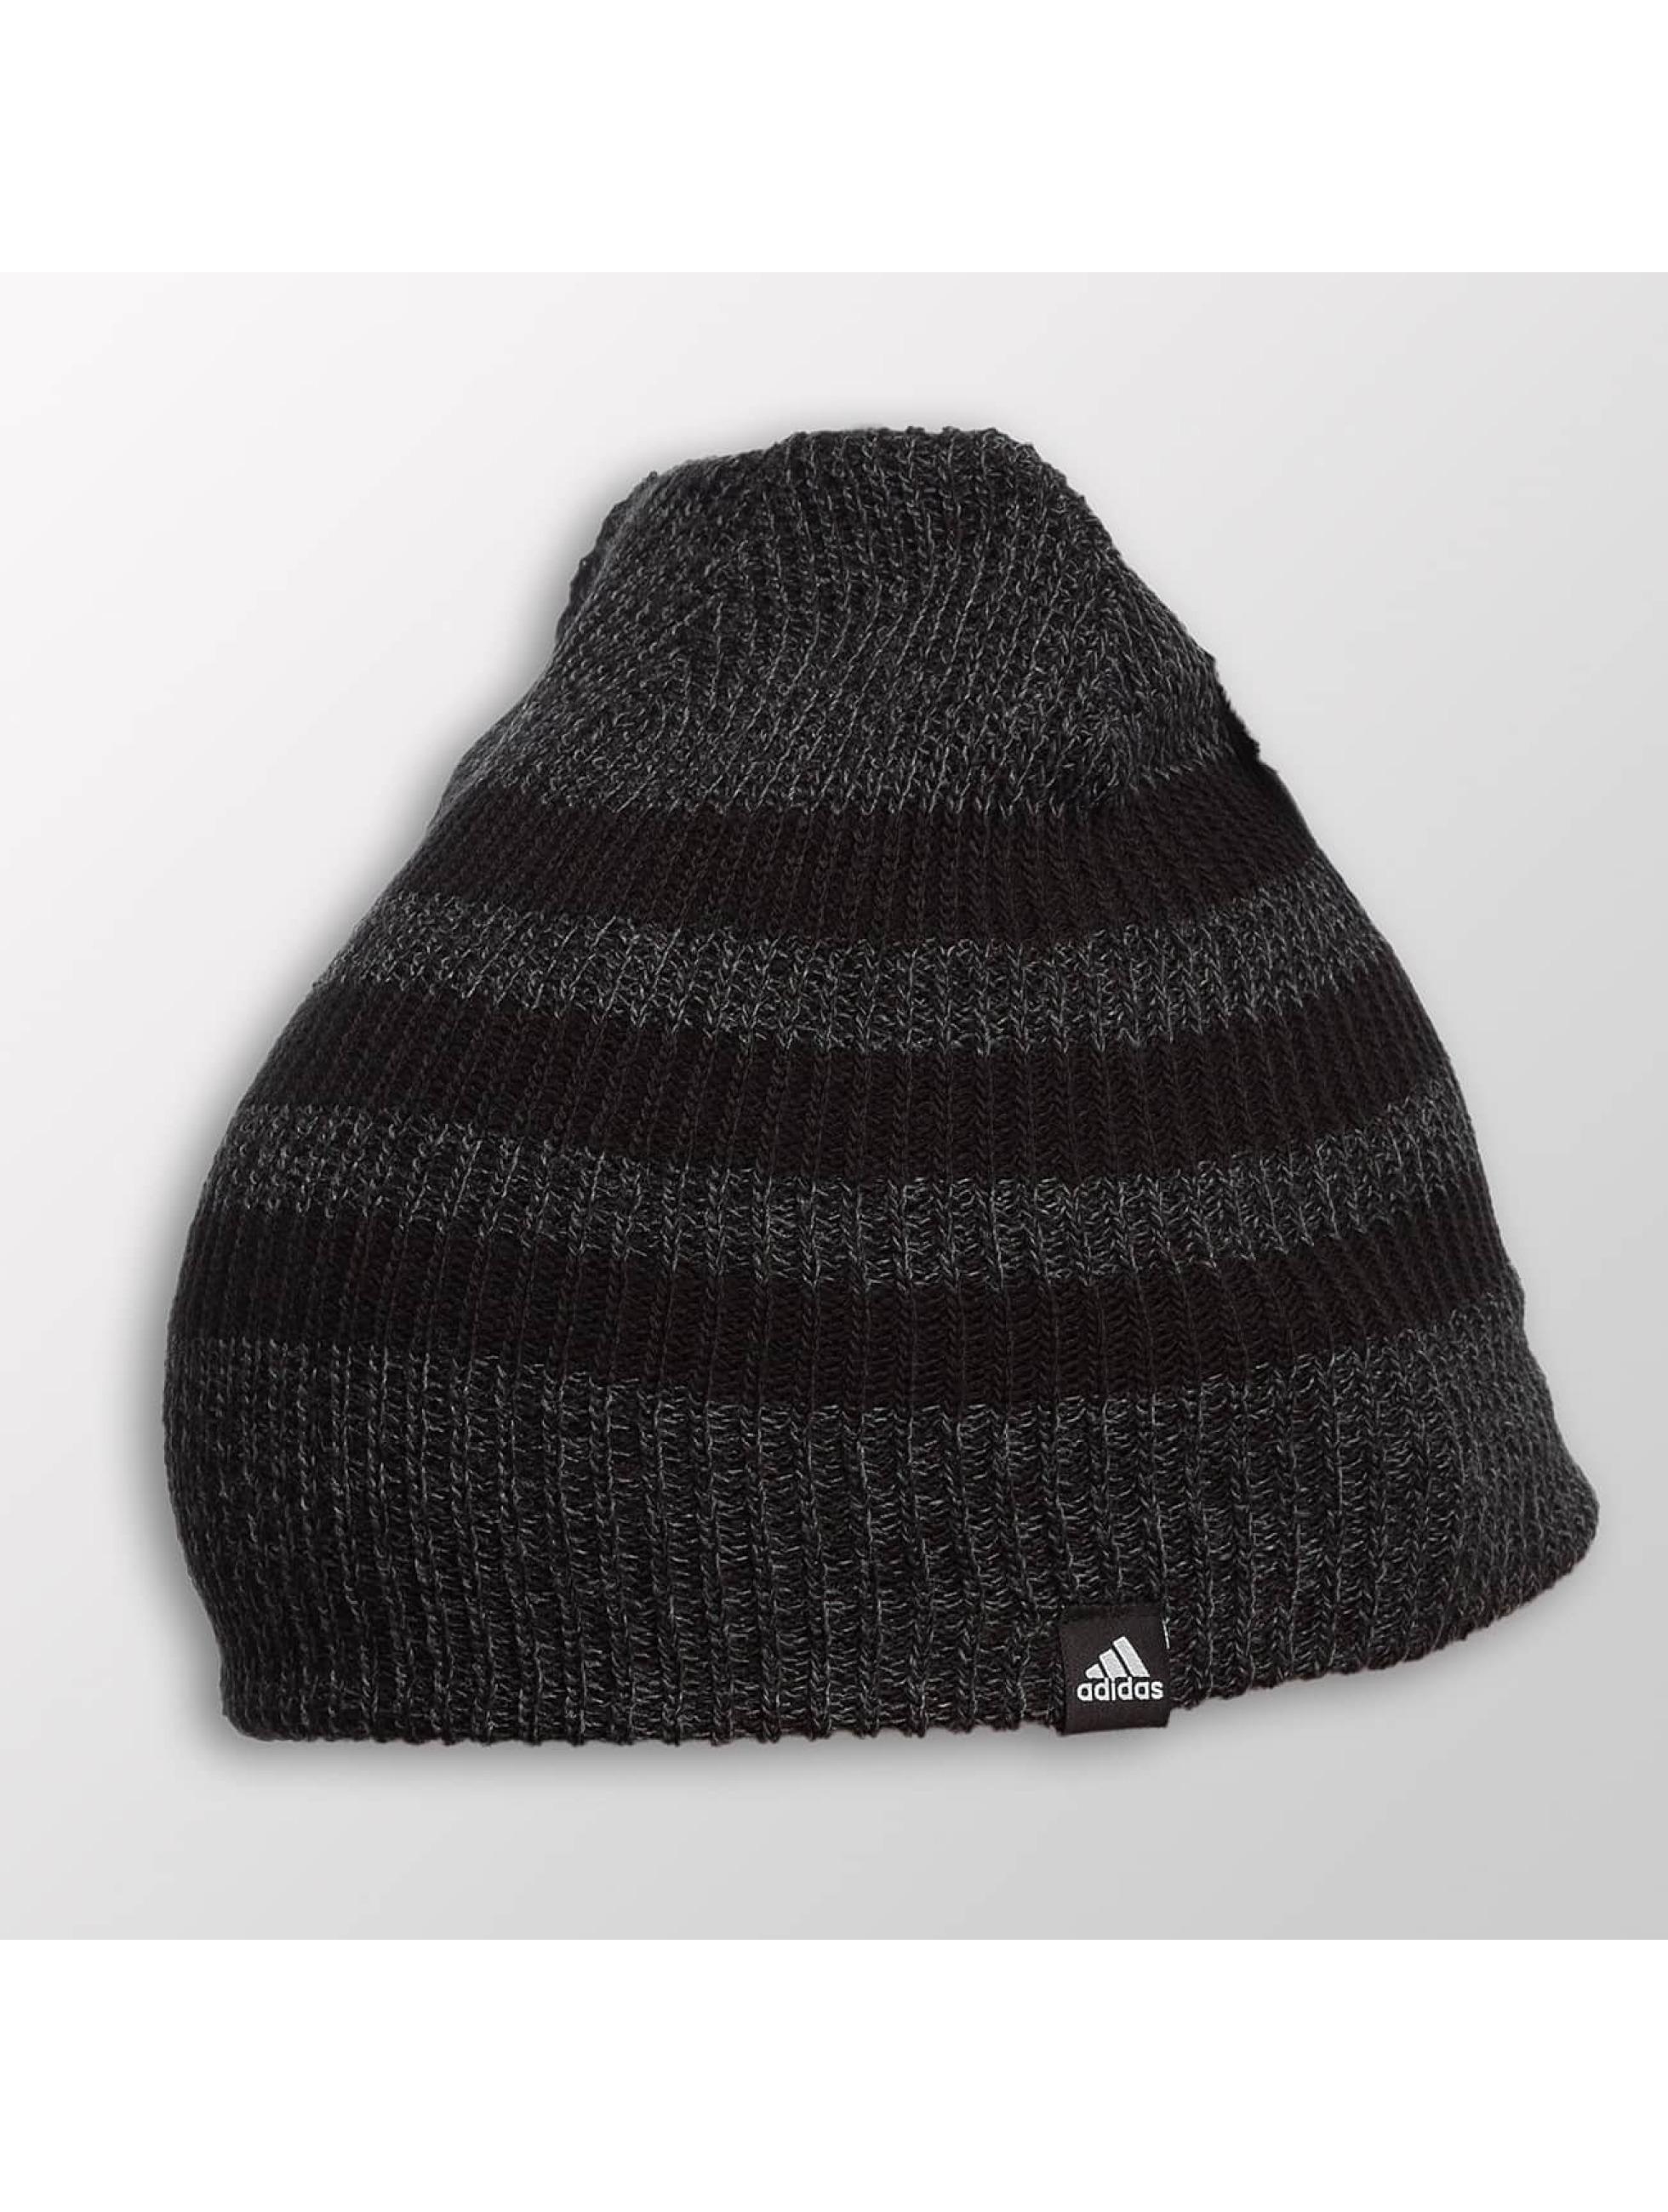 adidas Bonnet Adidas 3S noir